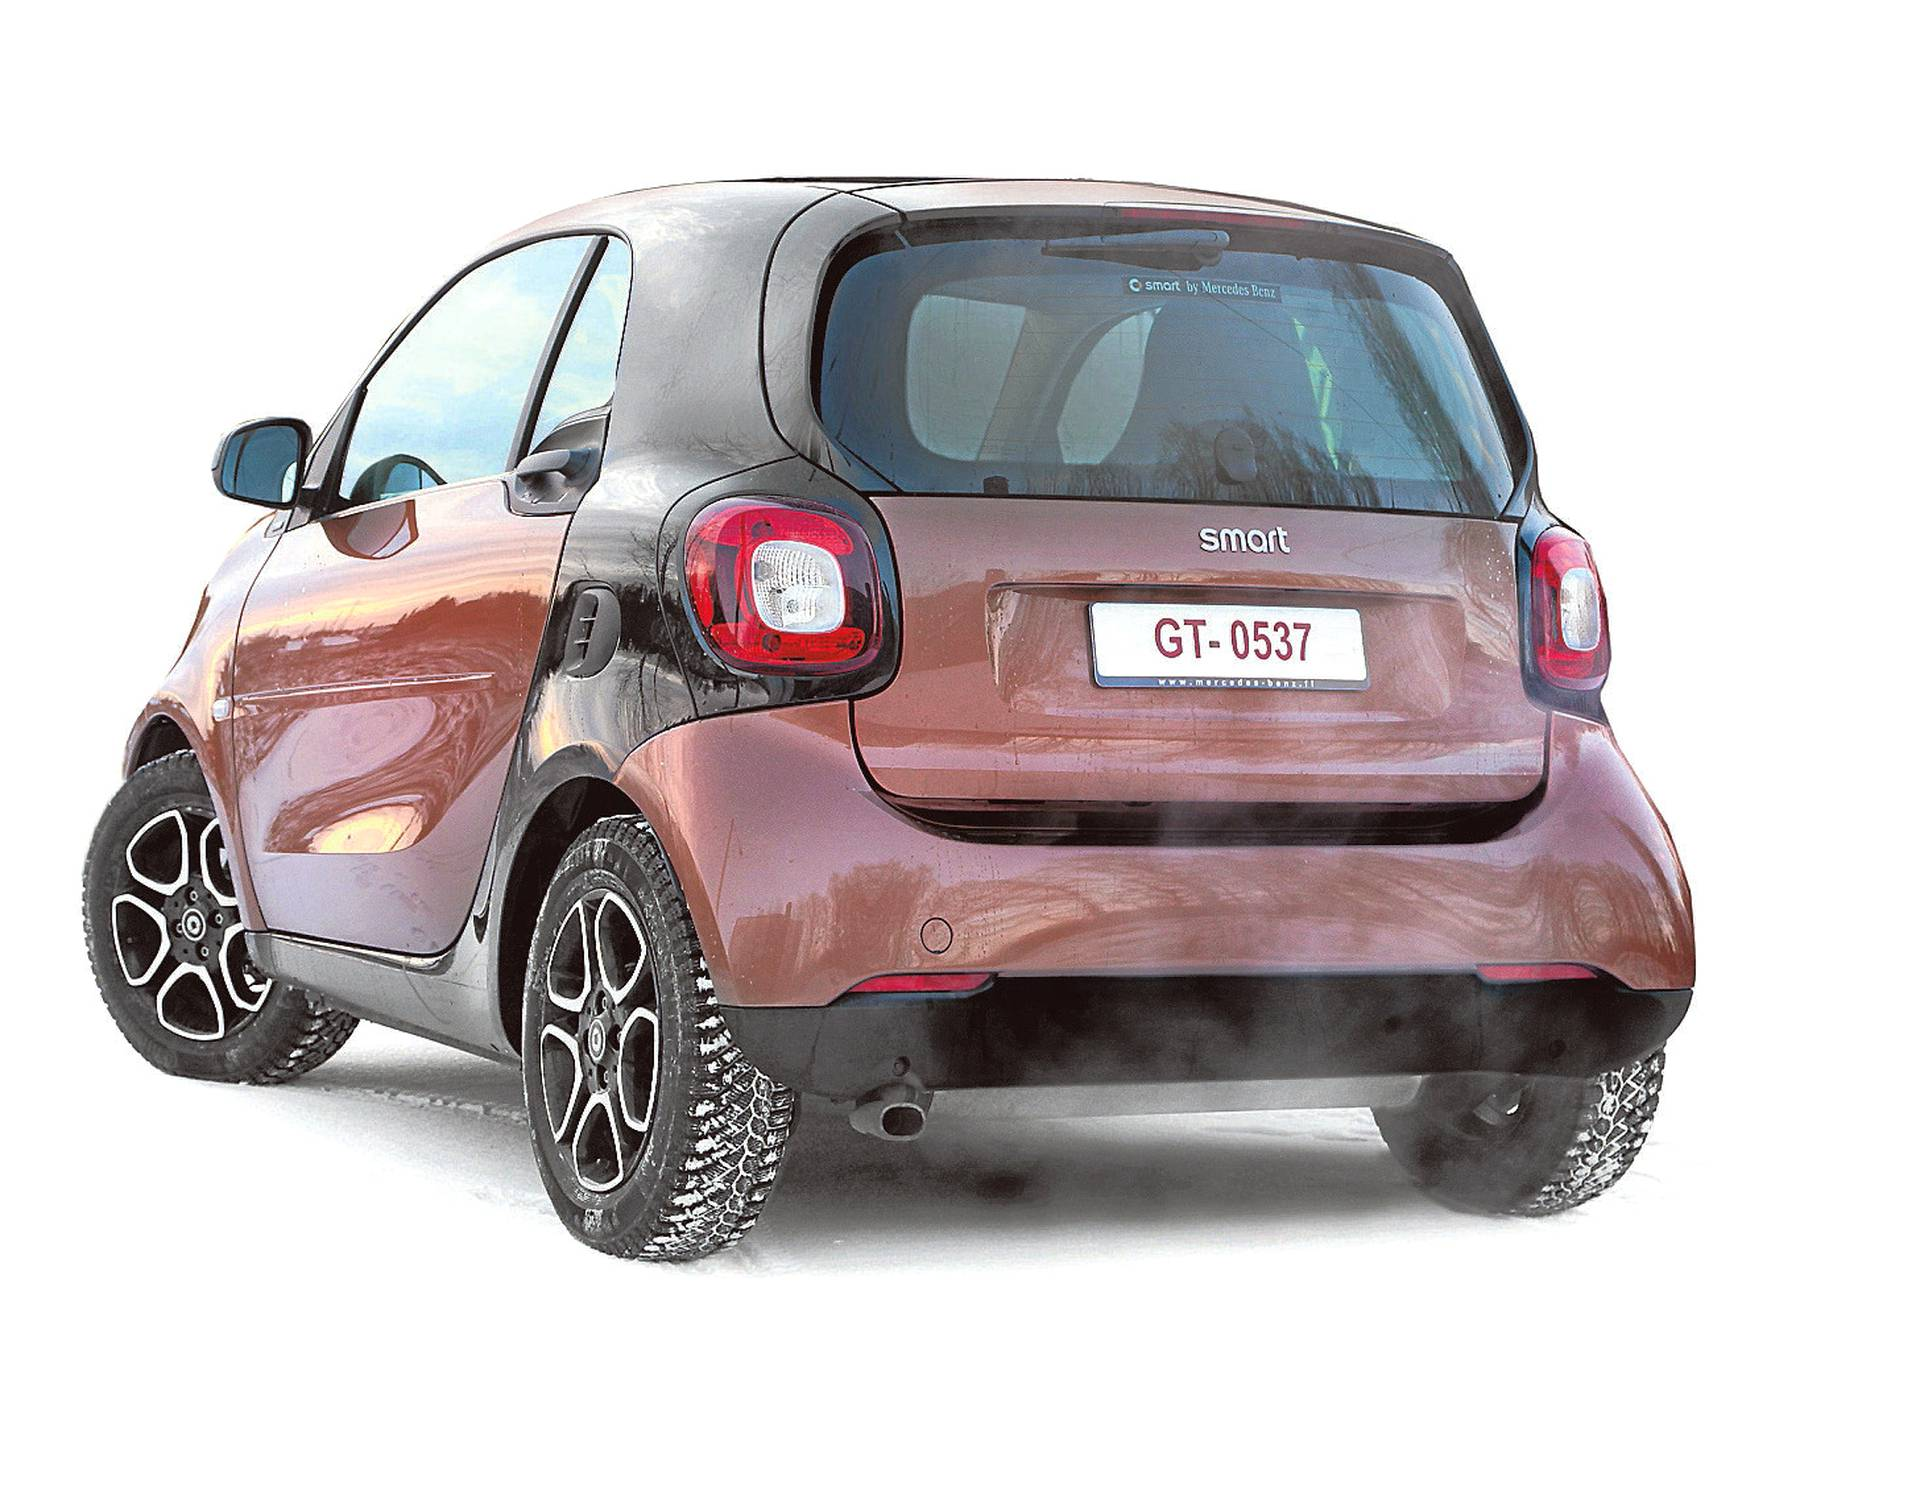 Mercedes Smart Car >> Smart Fortwo Coupe Prime Auto Hs Fi